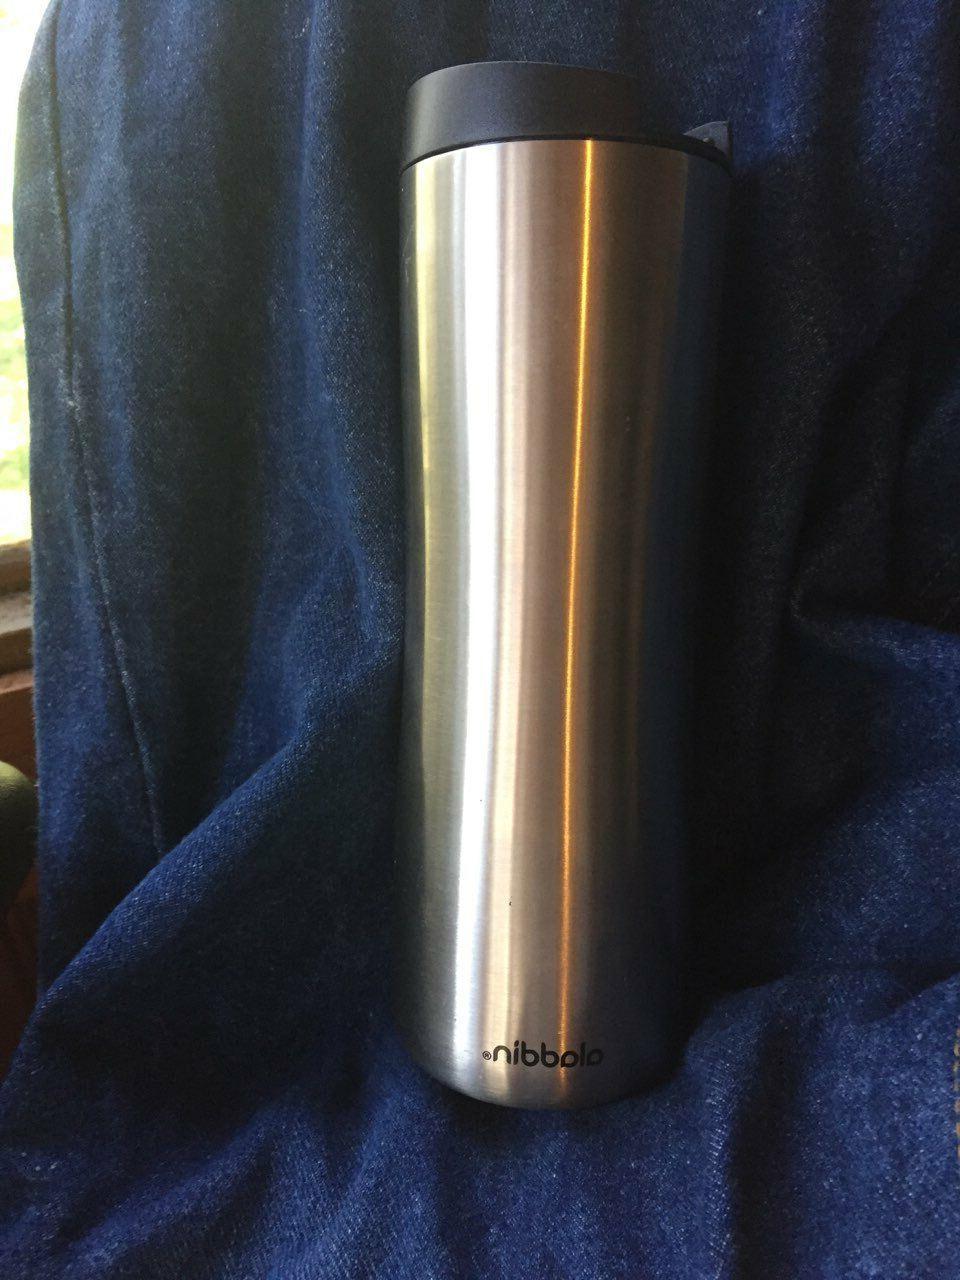 Aladdin Insulated Mug 16oz dishwasher safe